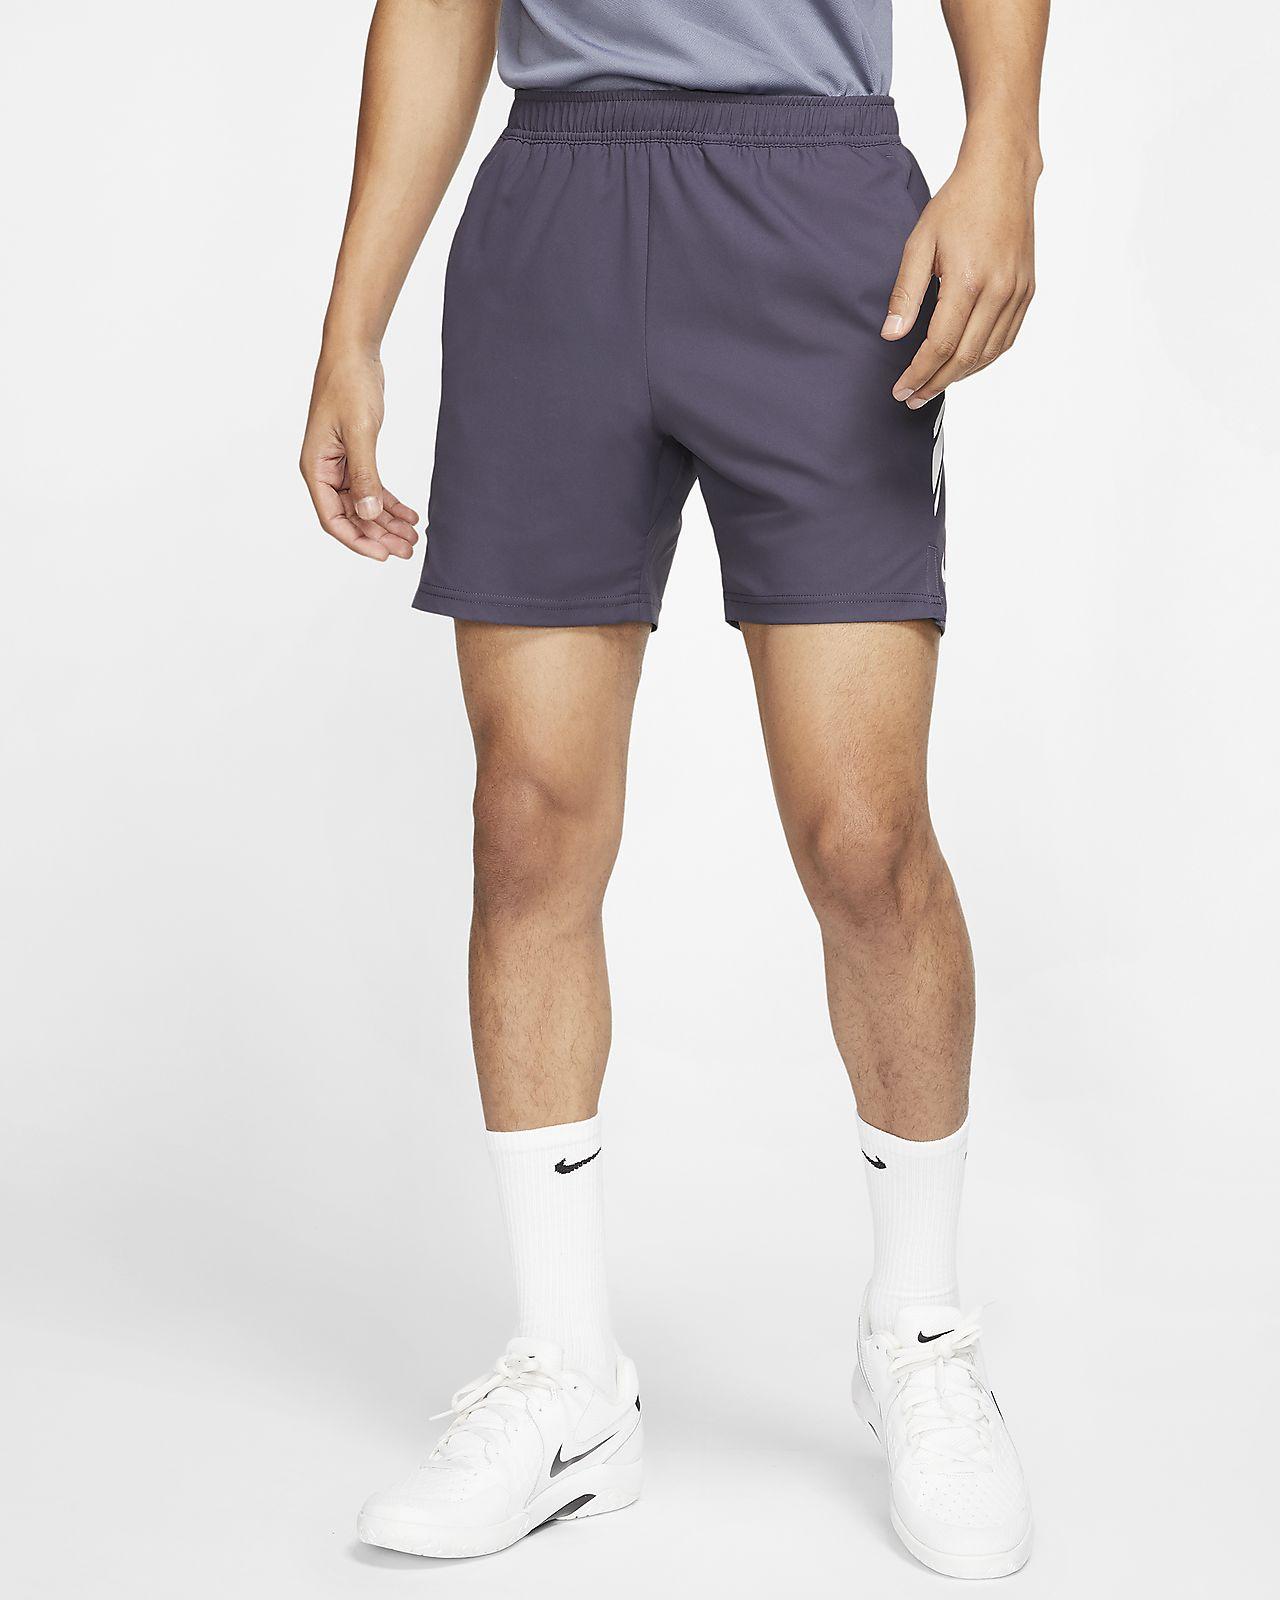 NikeCourt Dri-FIT tennisshorts til herre (18 cm)